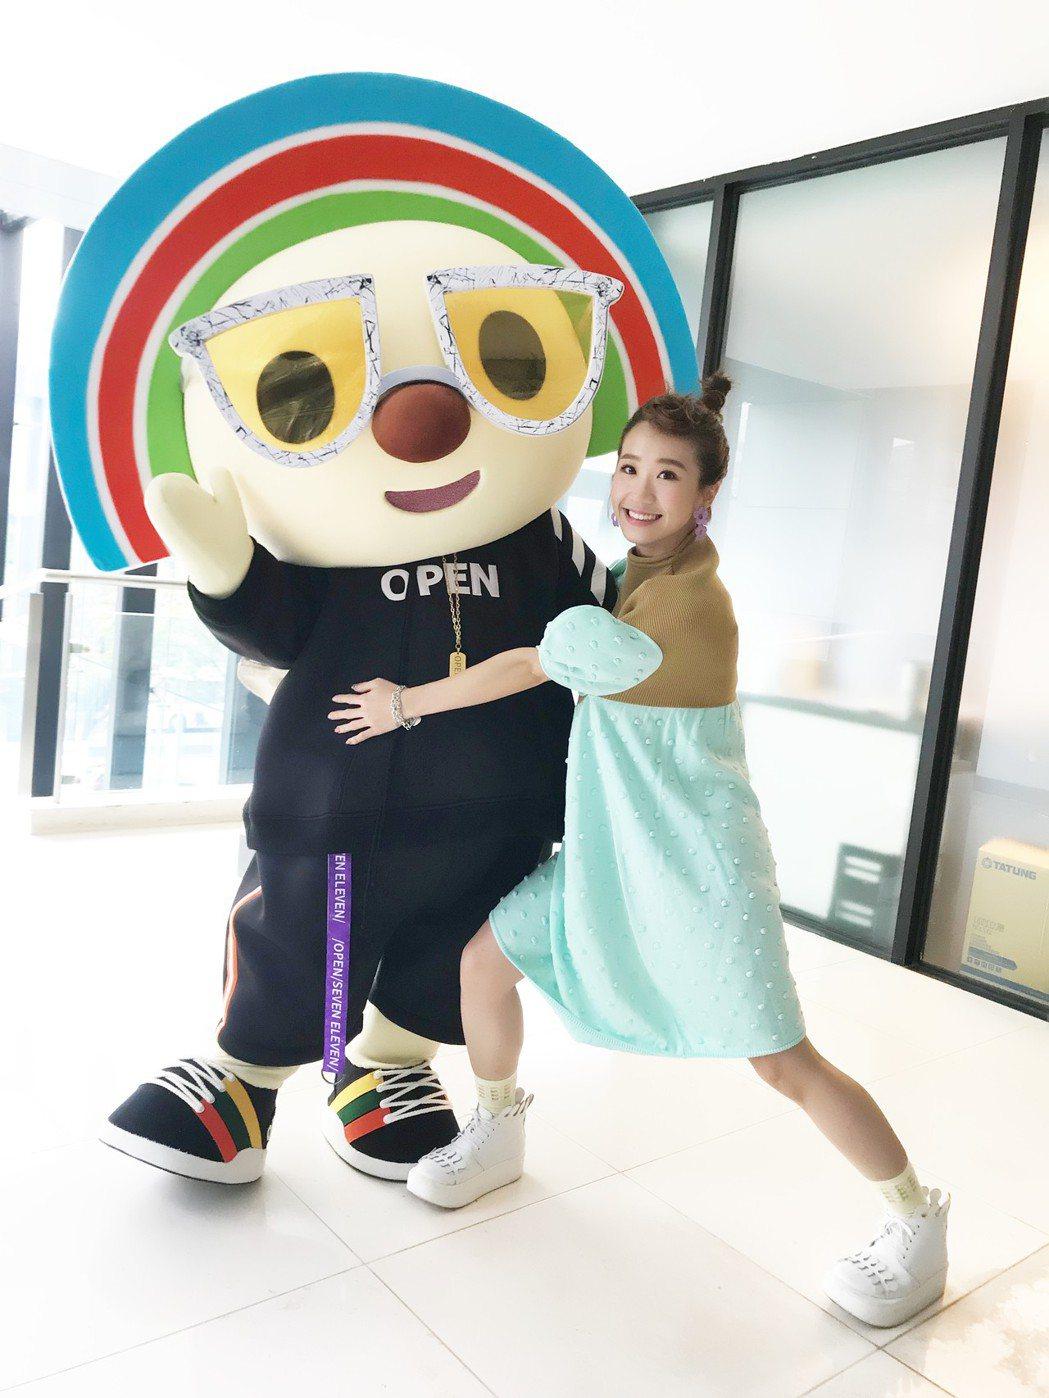 Lulu擔任「OPEN!遊行大使」直呼圓夢。圖/寬寬整合行銷提供